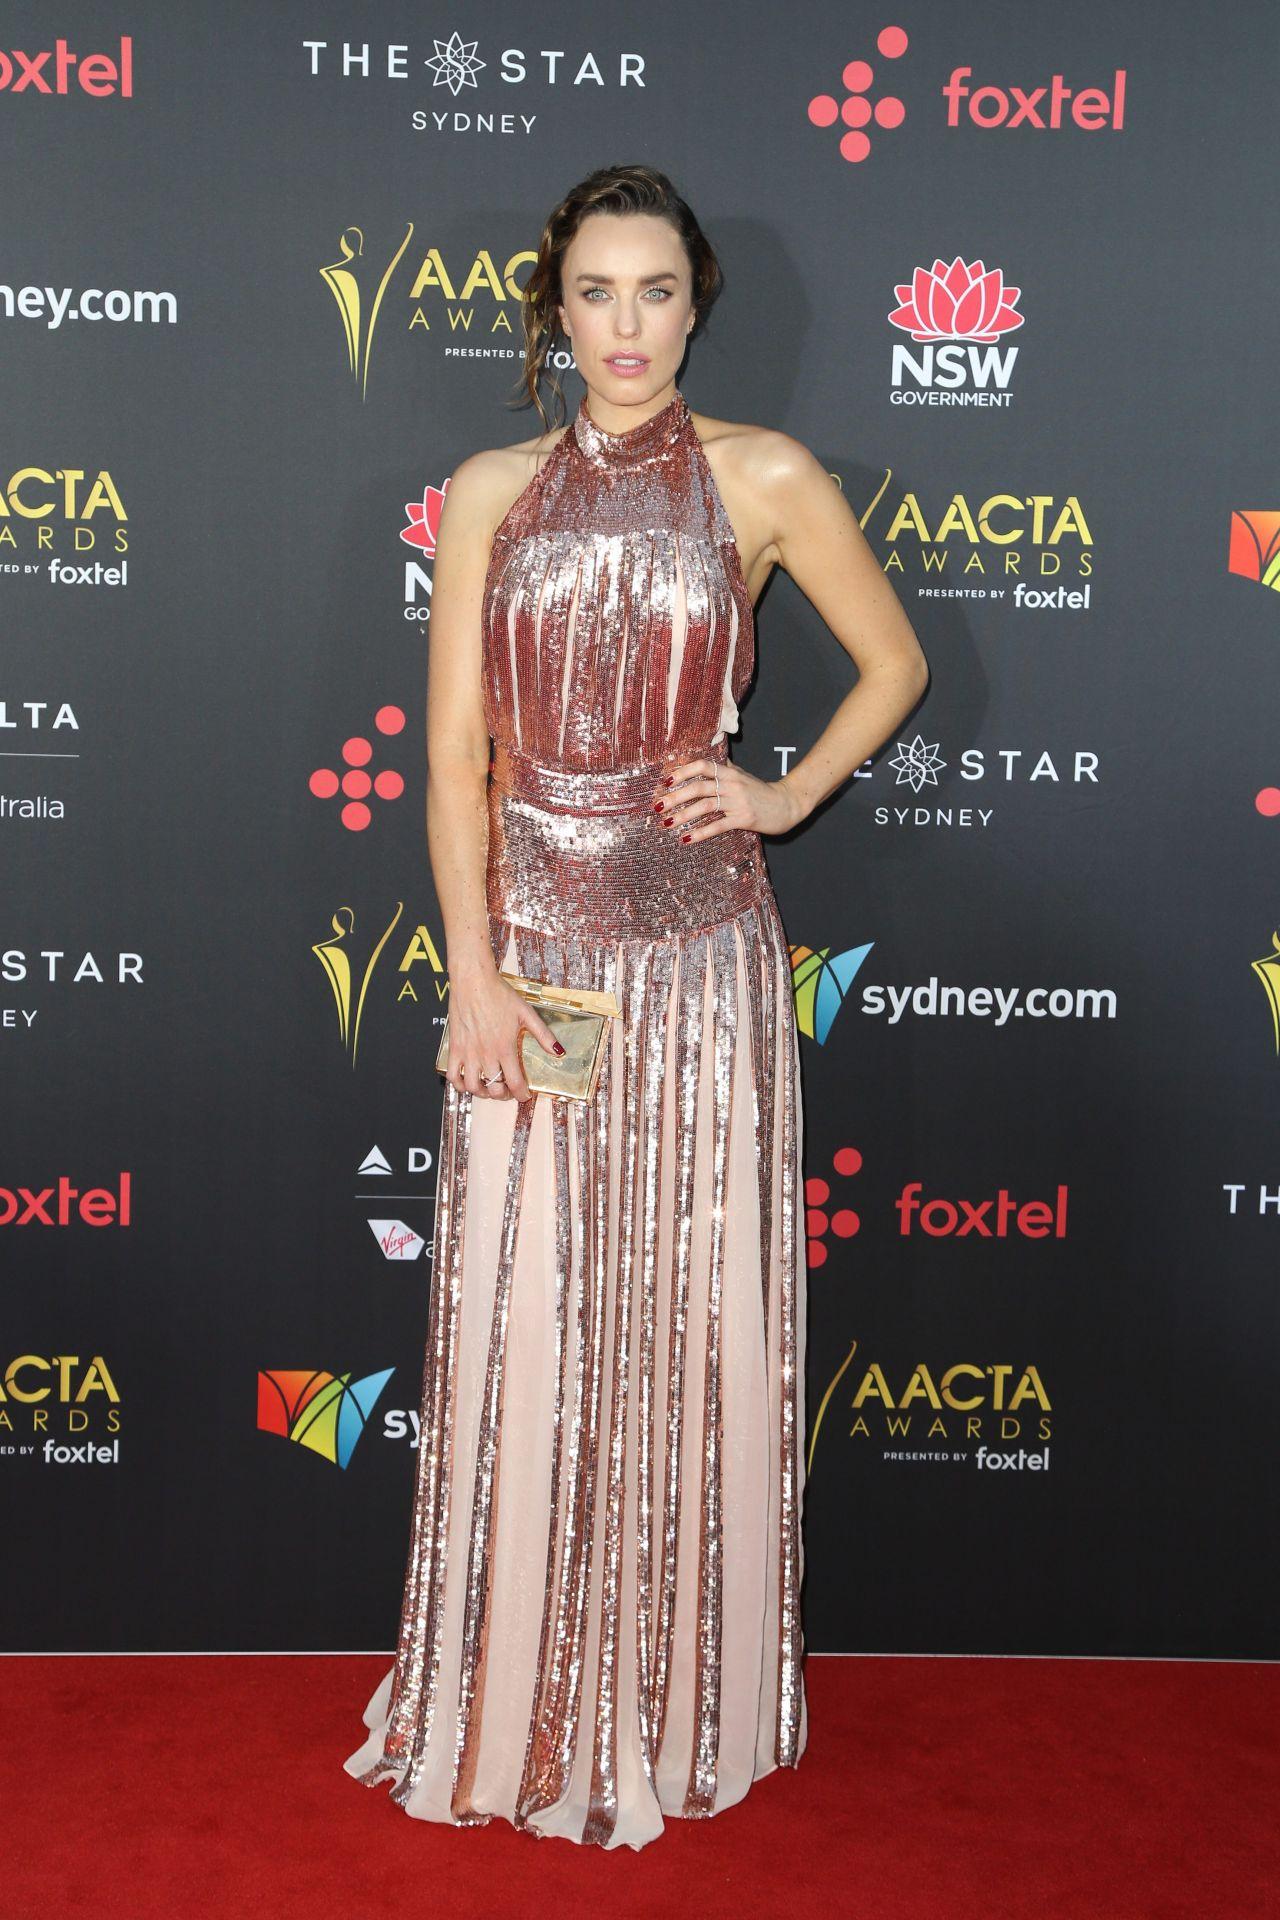 aacta awards - photo #22